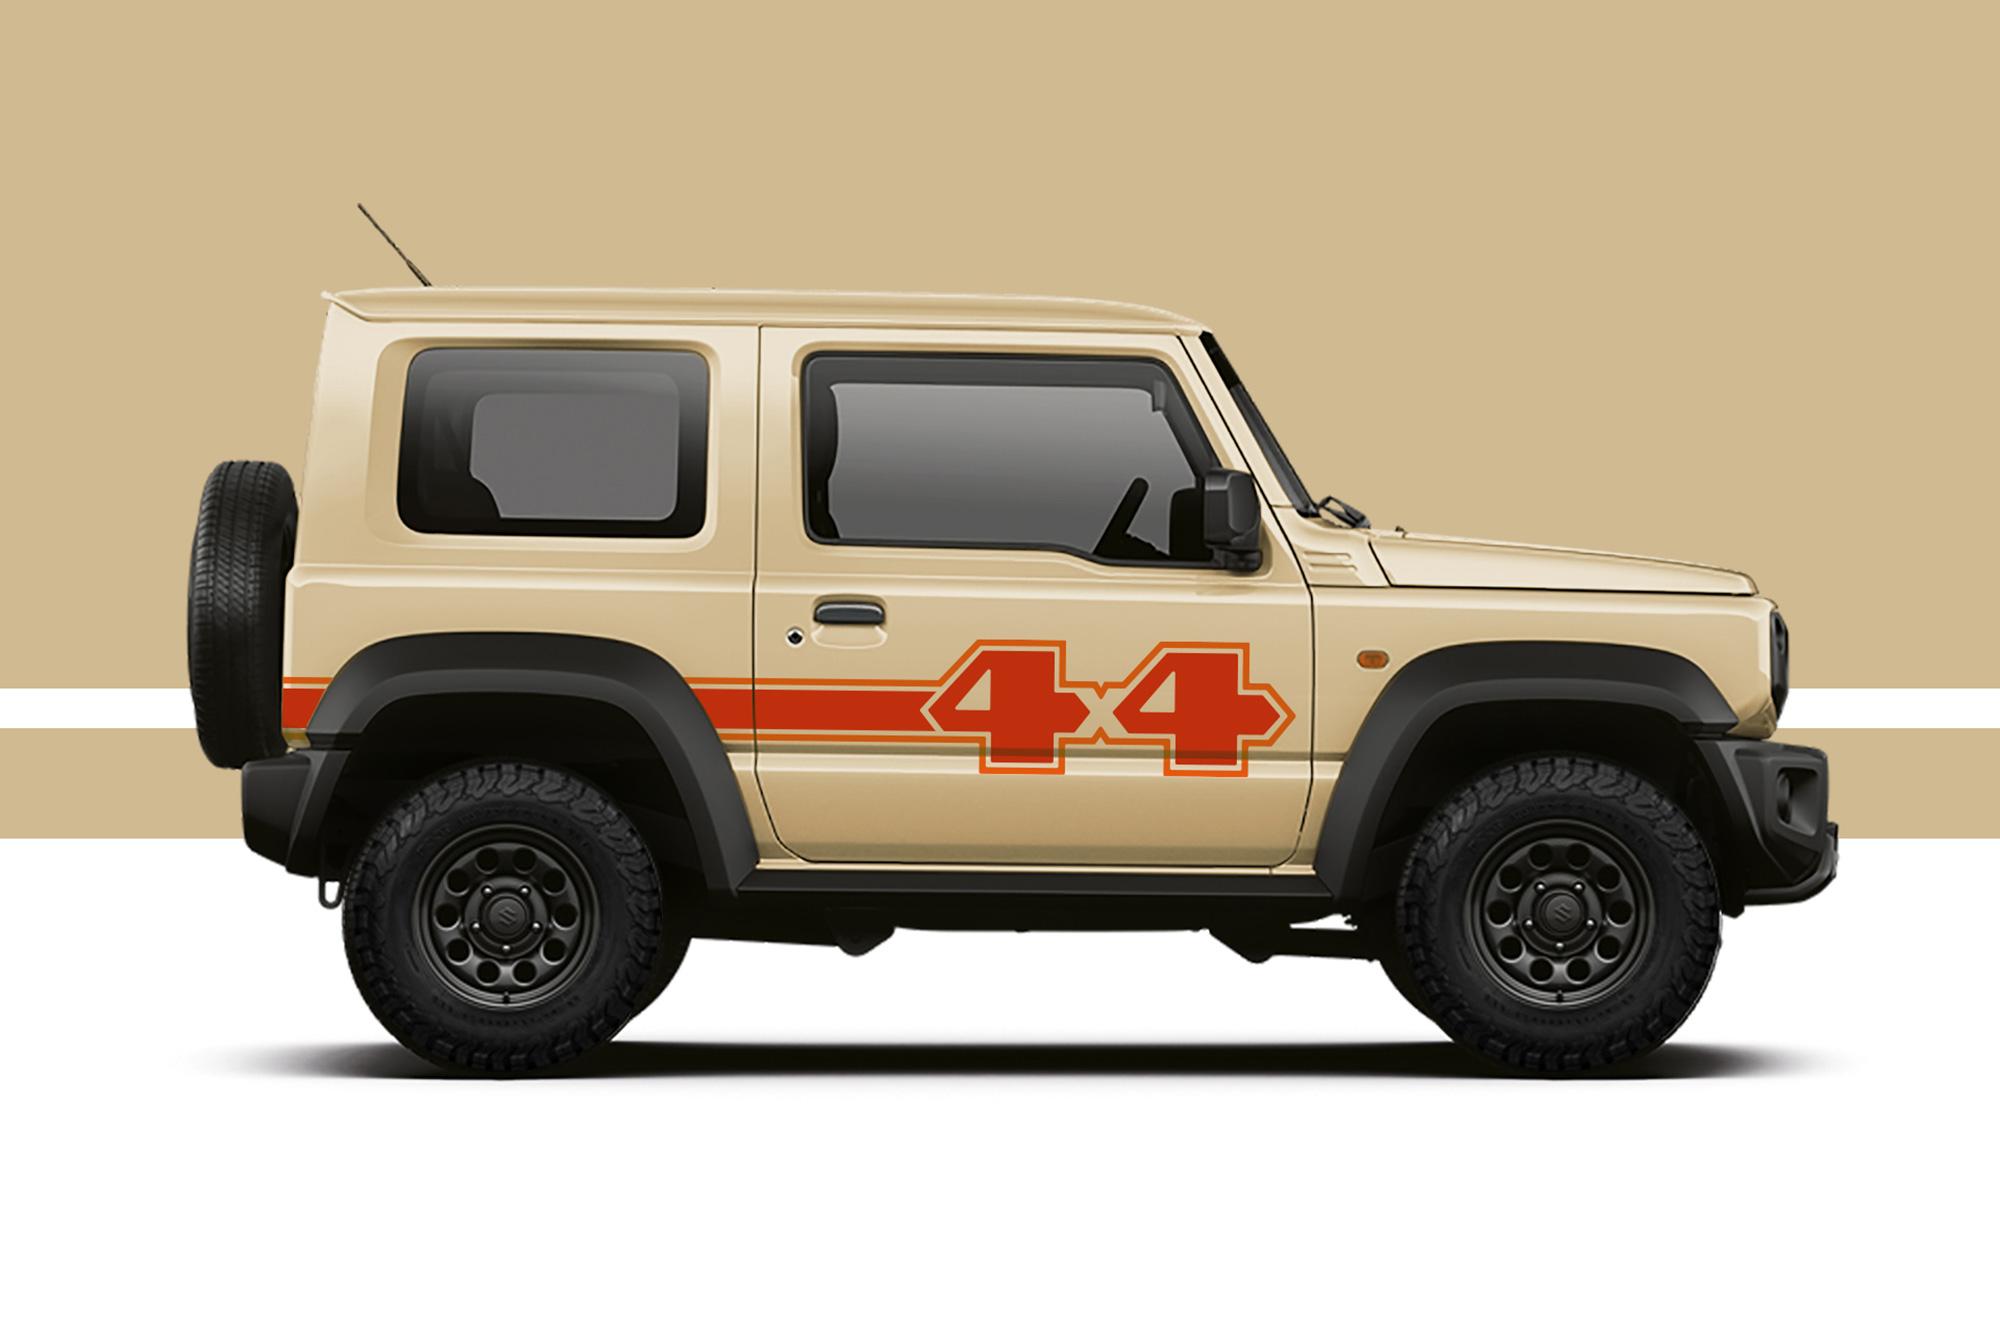 Jimny 'Datsun 4x4' Pick-up Inspired Livery